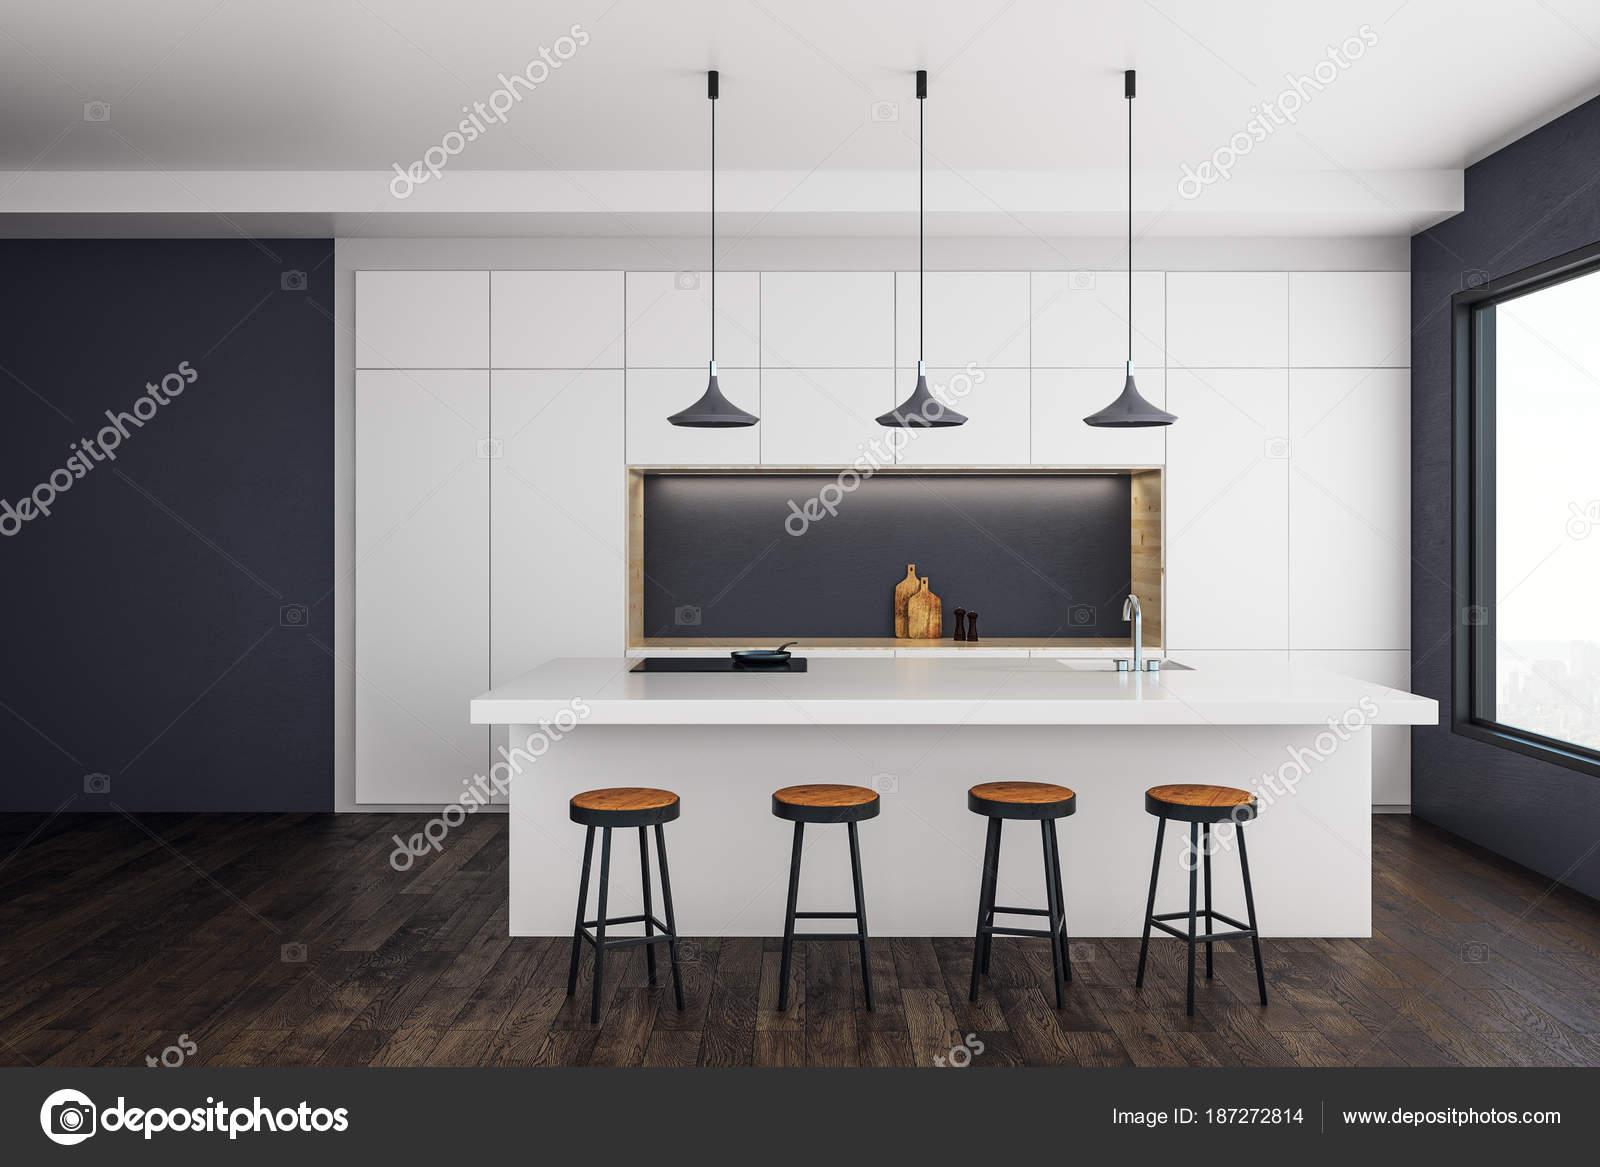 Cucina contemporanea studio u2014 foto stock © peshkova #187272814